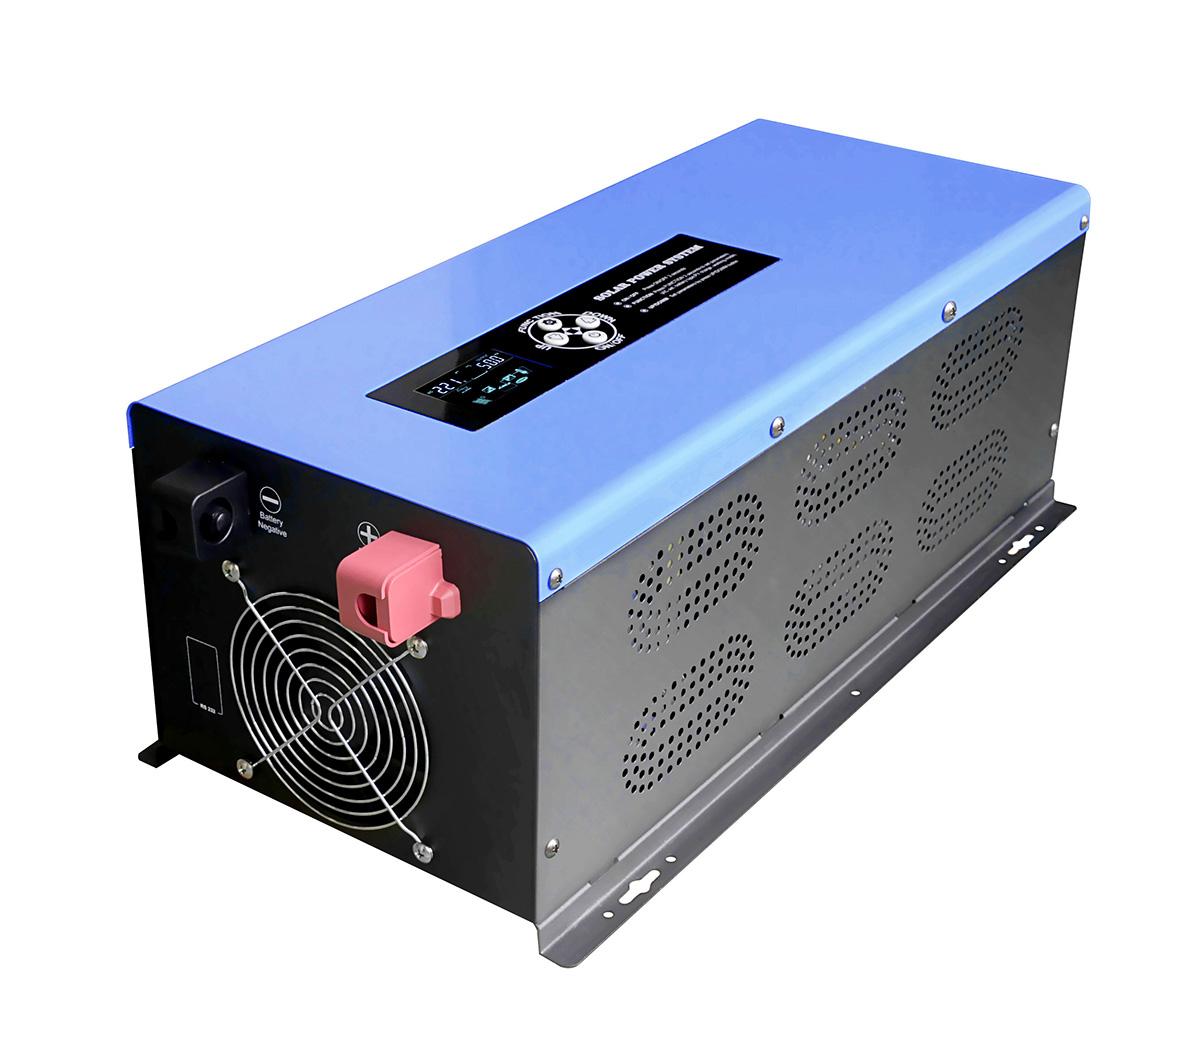 4KW/5KW/6KW Custom Reverse control machine